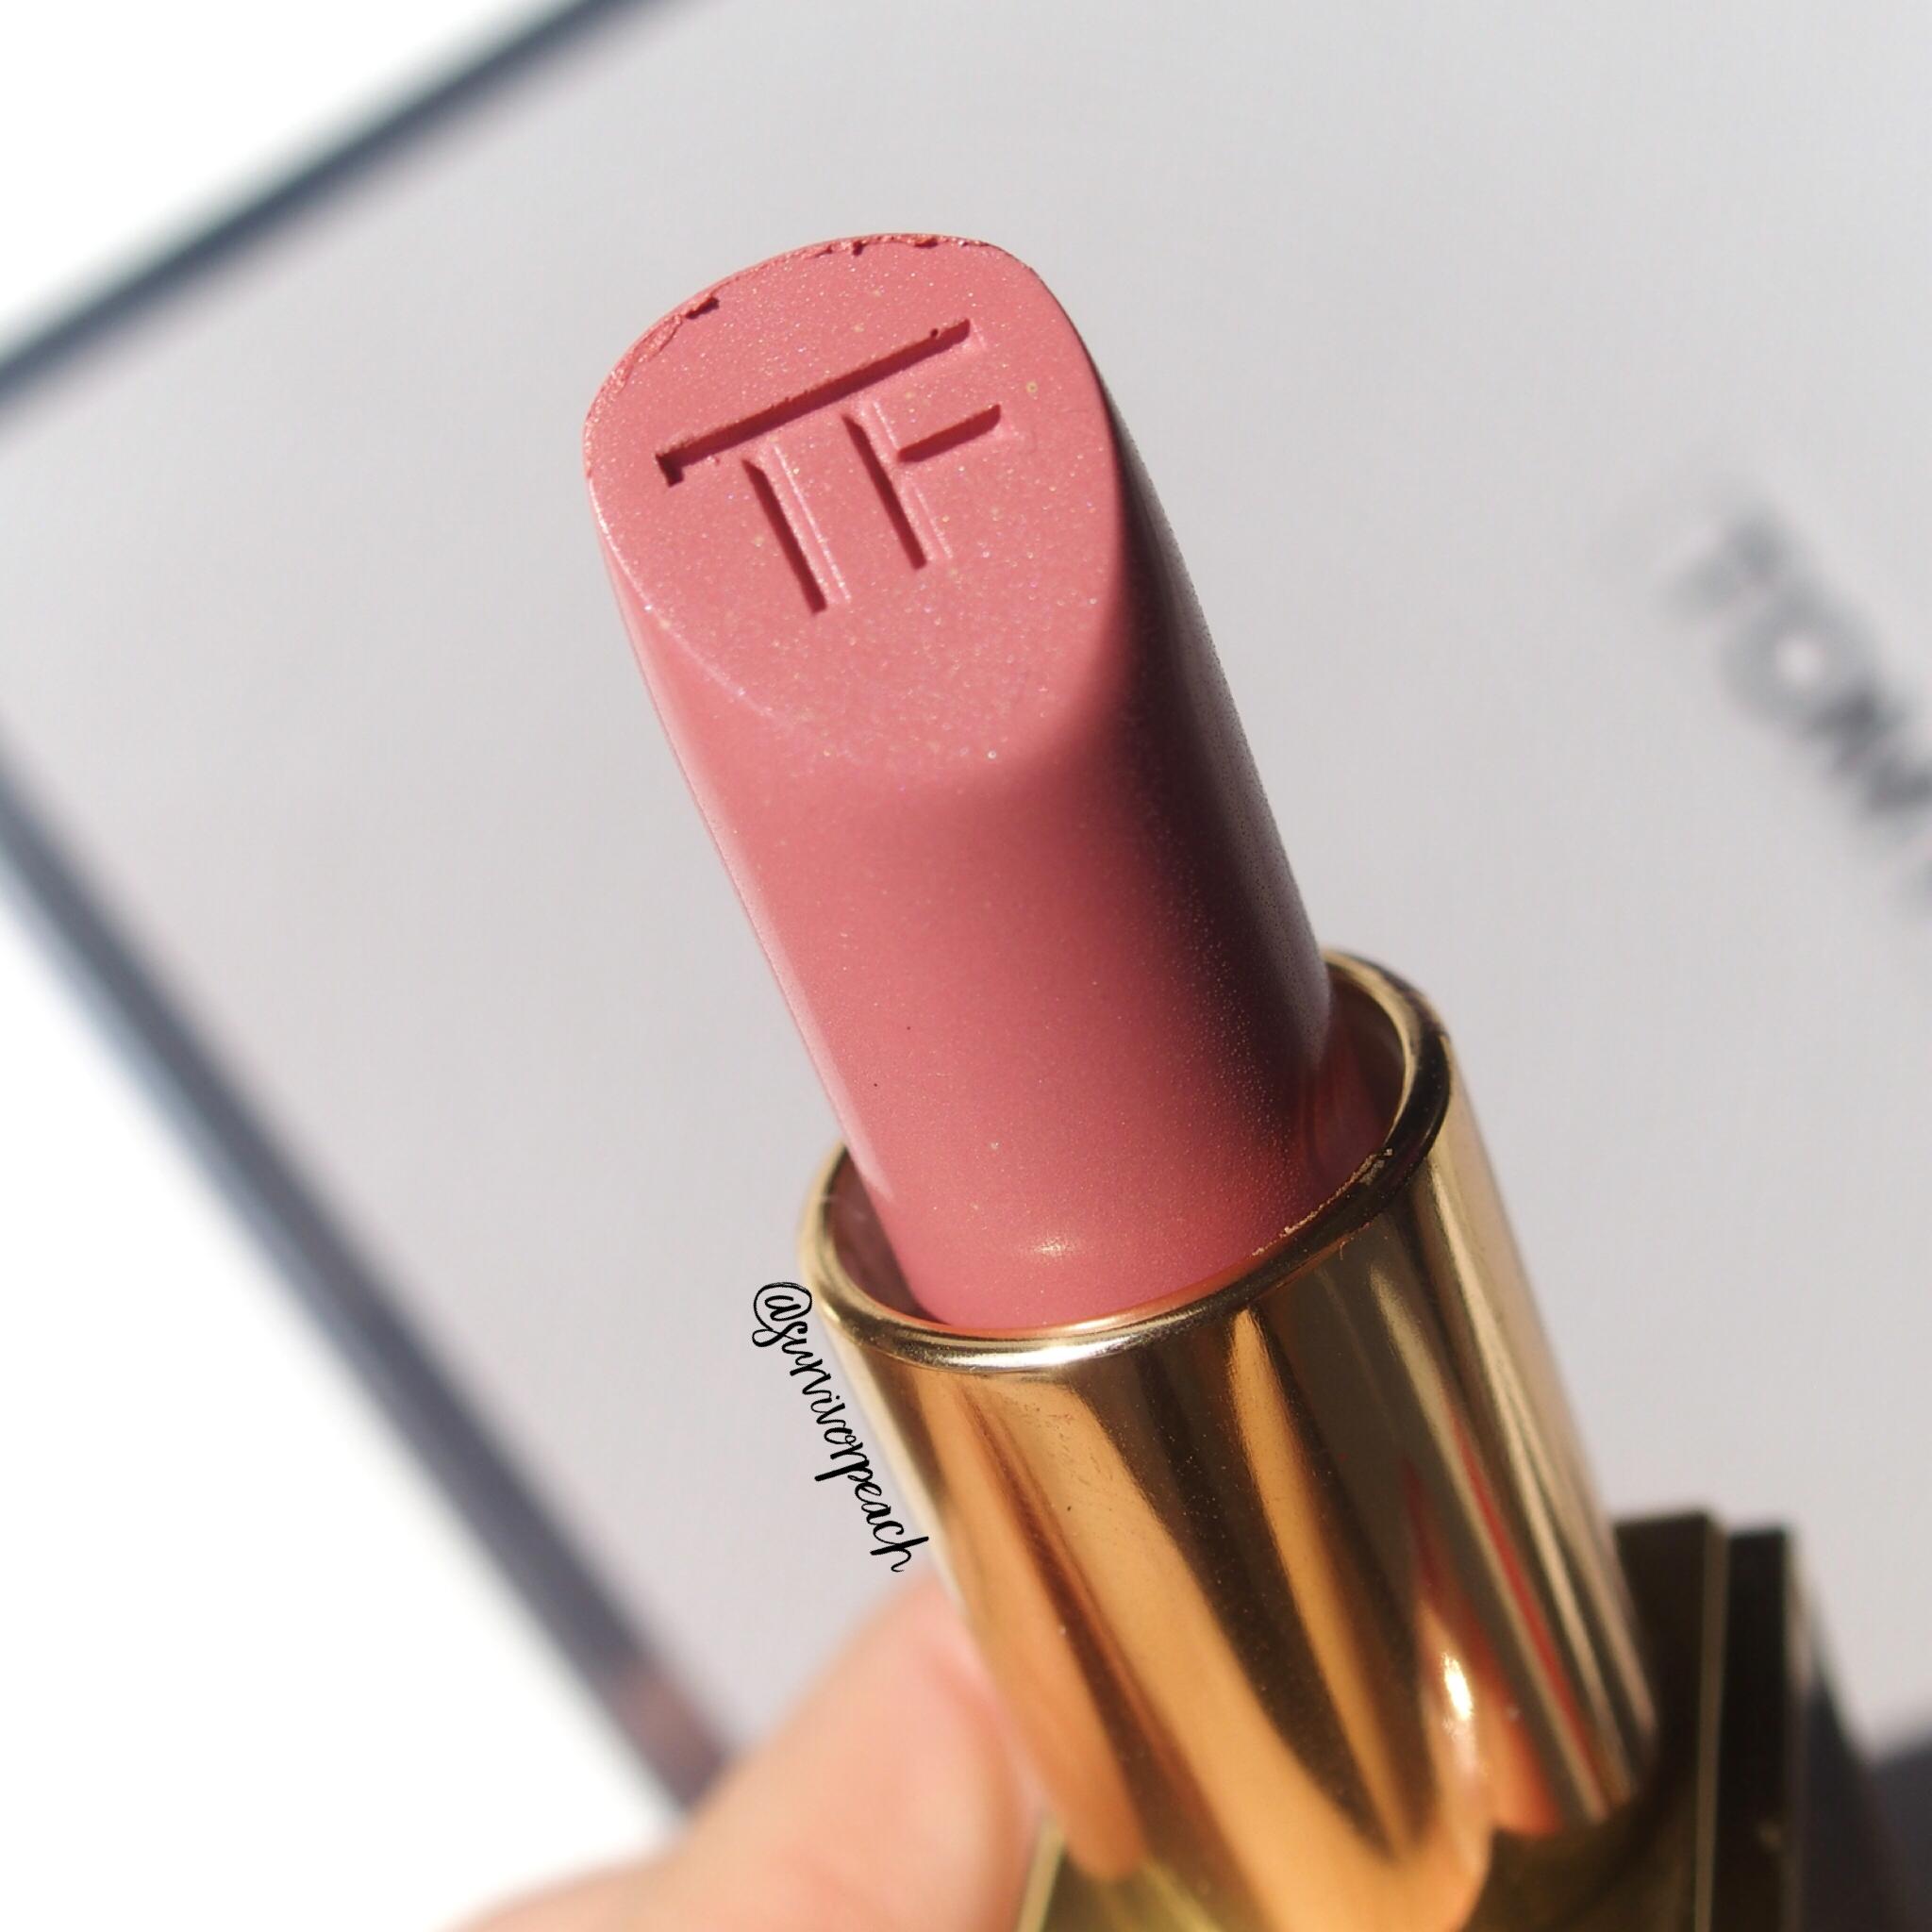 Tom Ford Lipsticks in Paper Doll